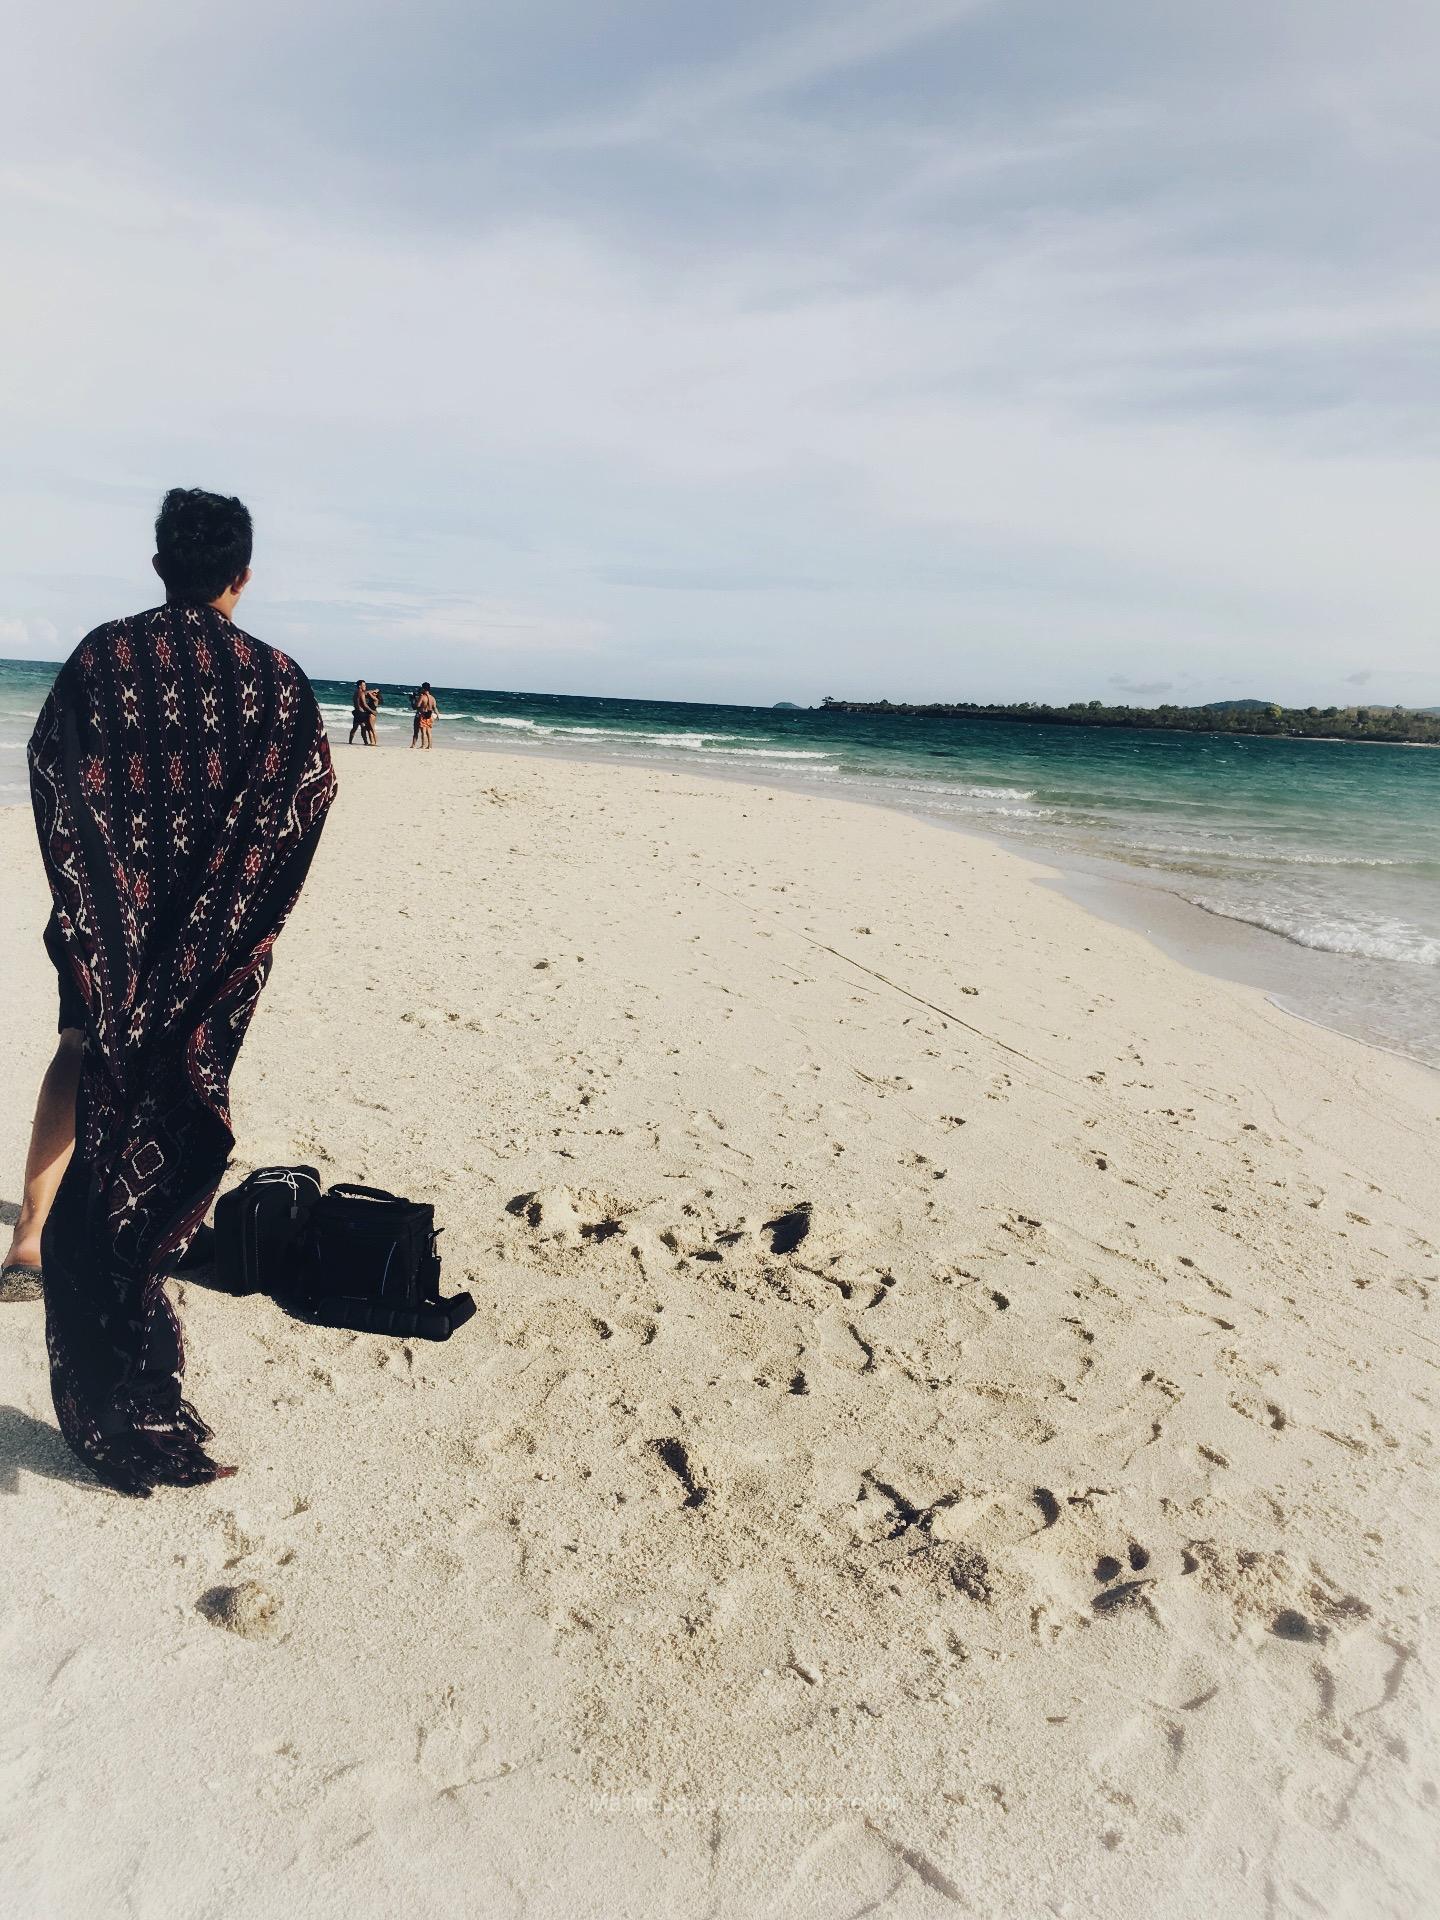 Palad Sandbar